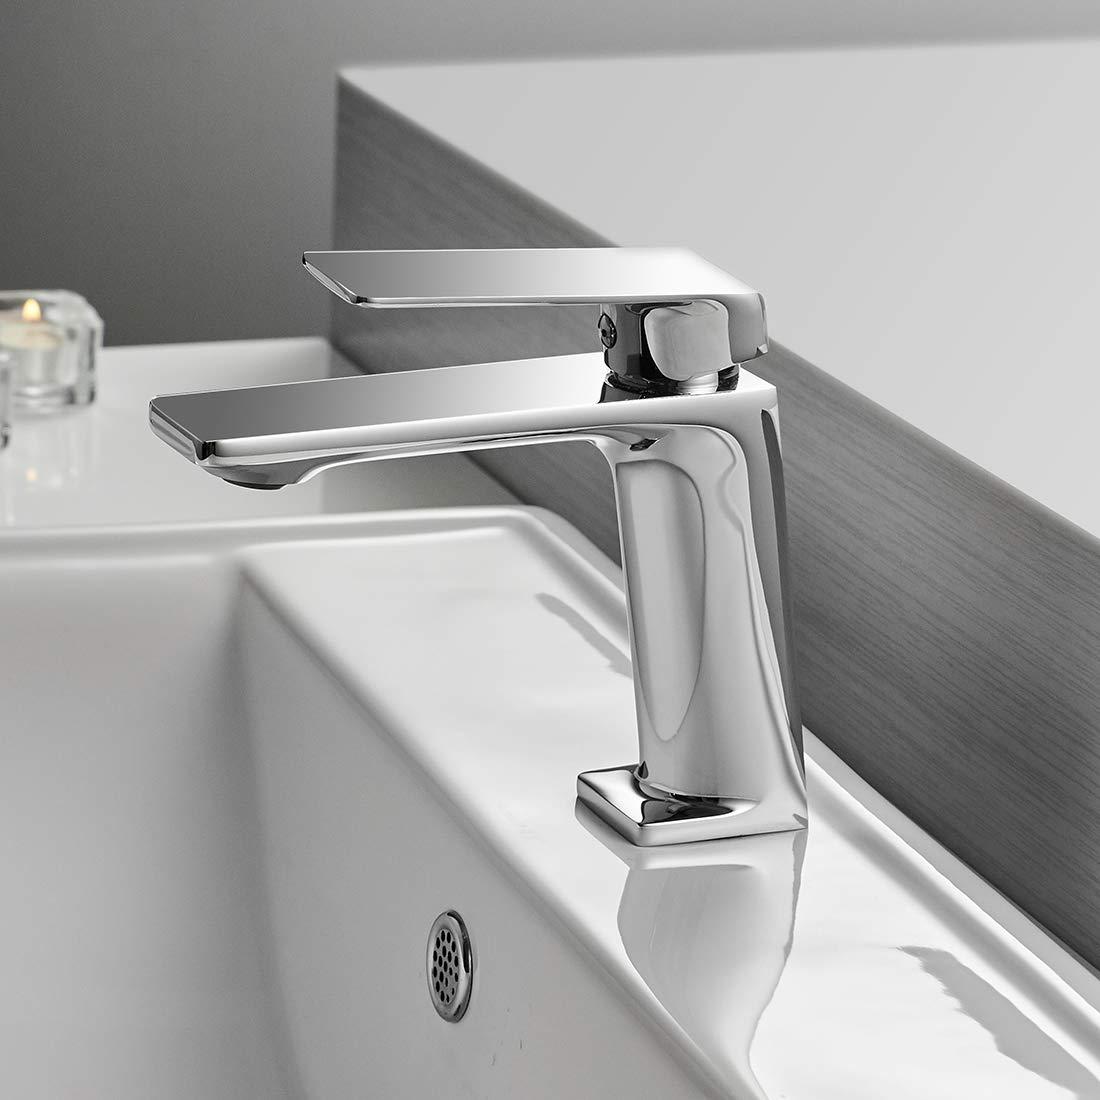 WANFAN Modern Bathroom Sink Faucet Single Handle One Hole Deck Mount Lavatory Laundry Vanity Sink Faucet Brass Polished Gold 9922K